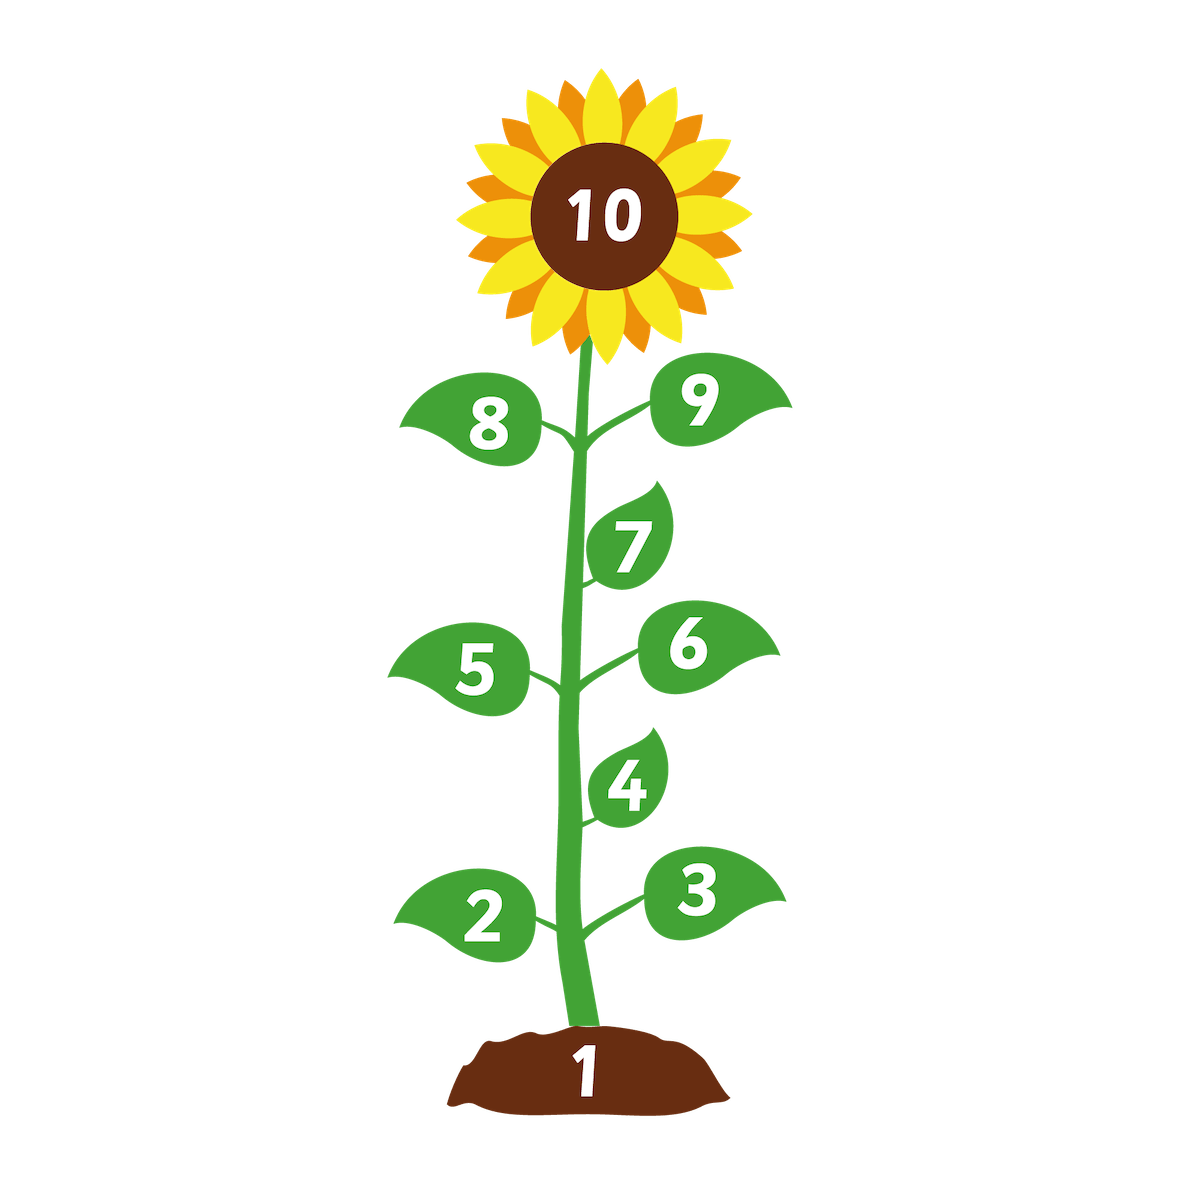 Playground Marking Sunflower Hopscotch